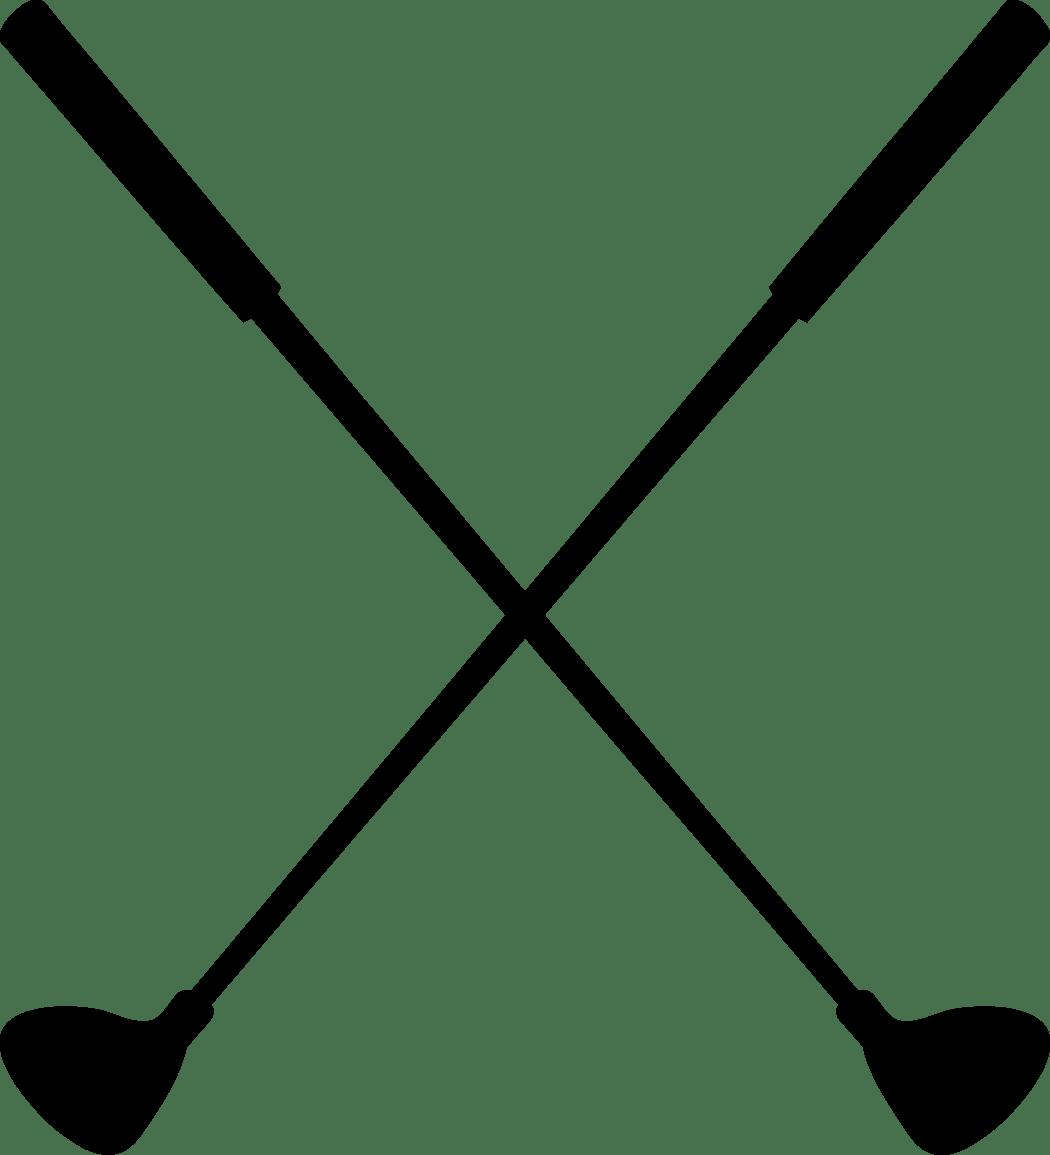 Library Of Crossed Baseball Bats Clip Art Freeuse Stock